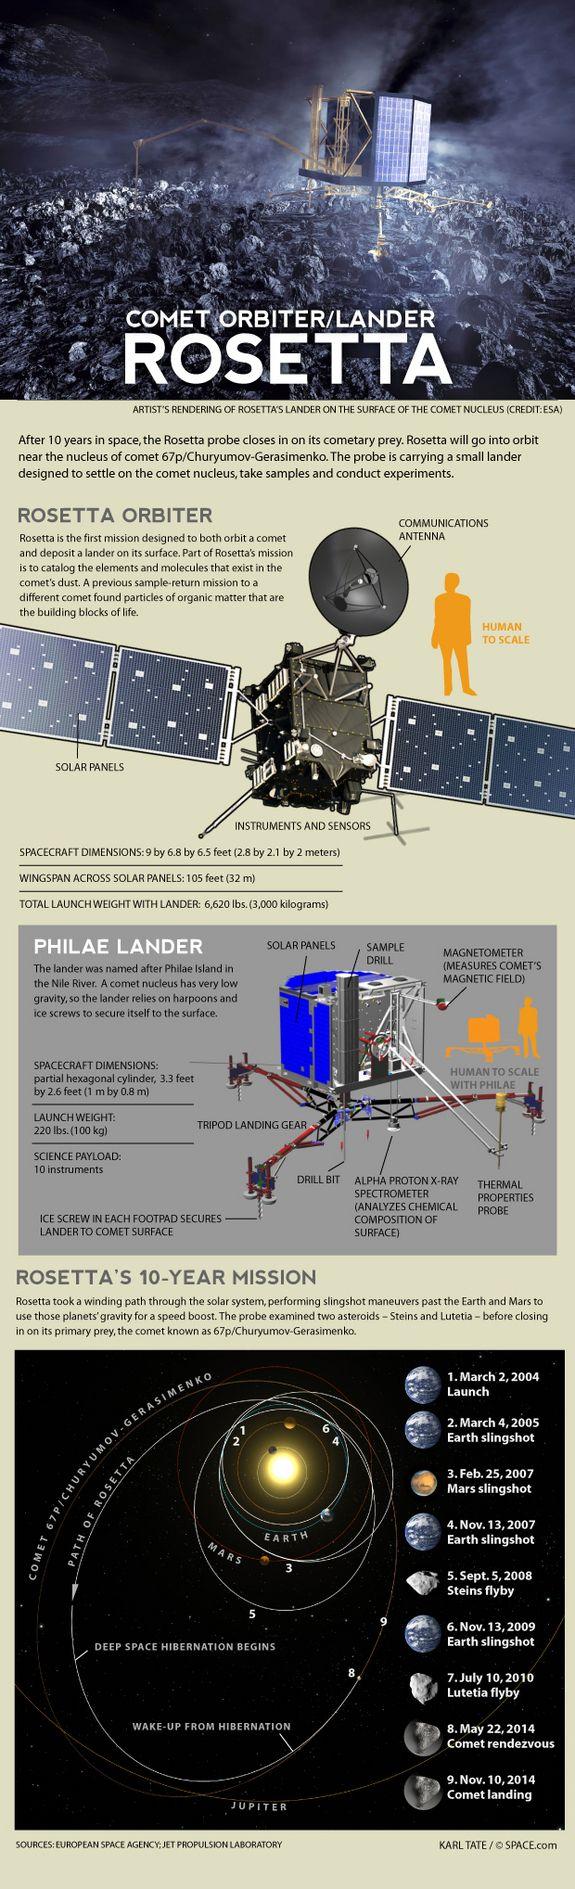 How The Rosetta Spacecraft Will Land On A Comet 67P/Churyumov-Gerasimenko | Space